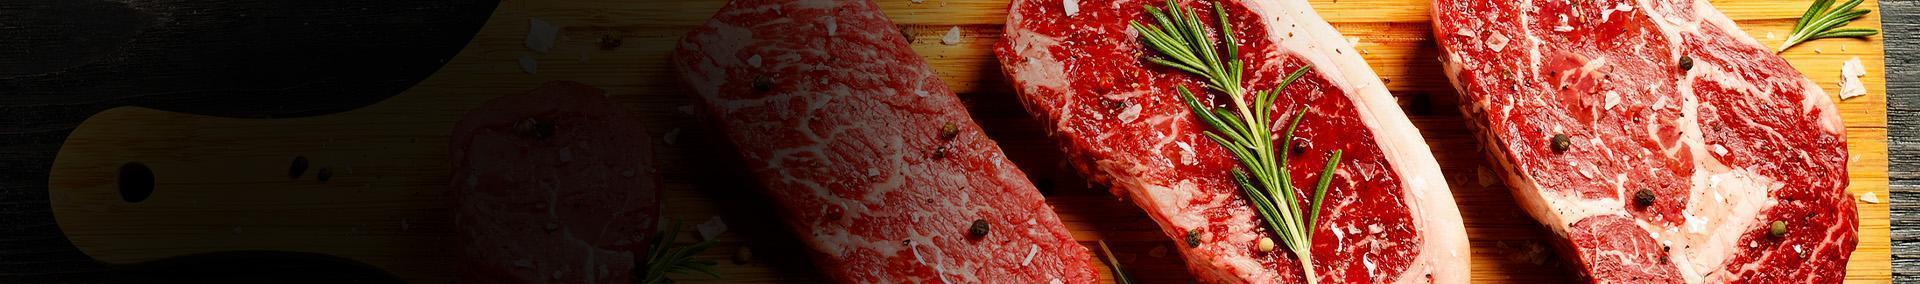 Steki mięsne